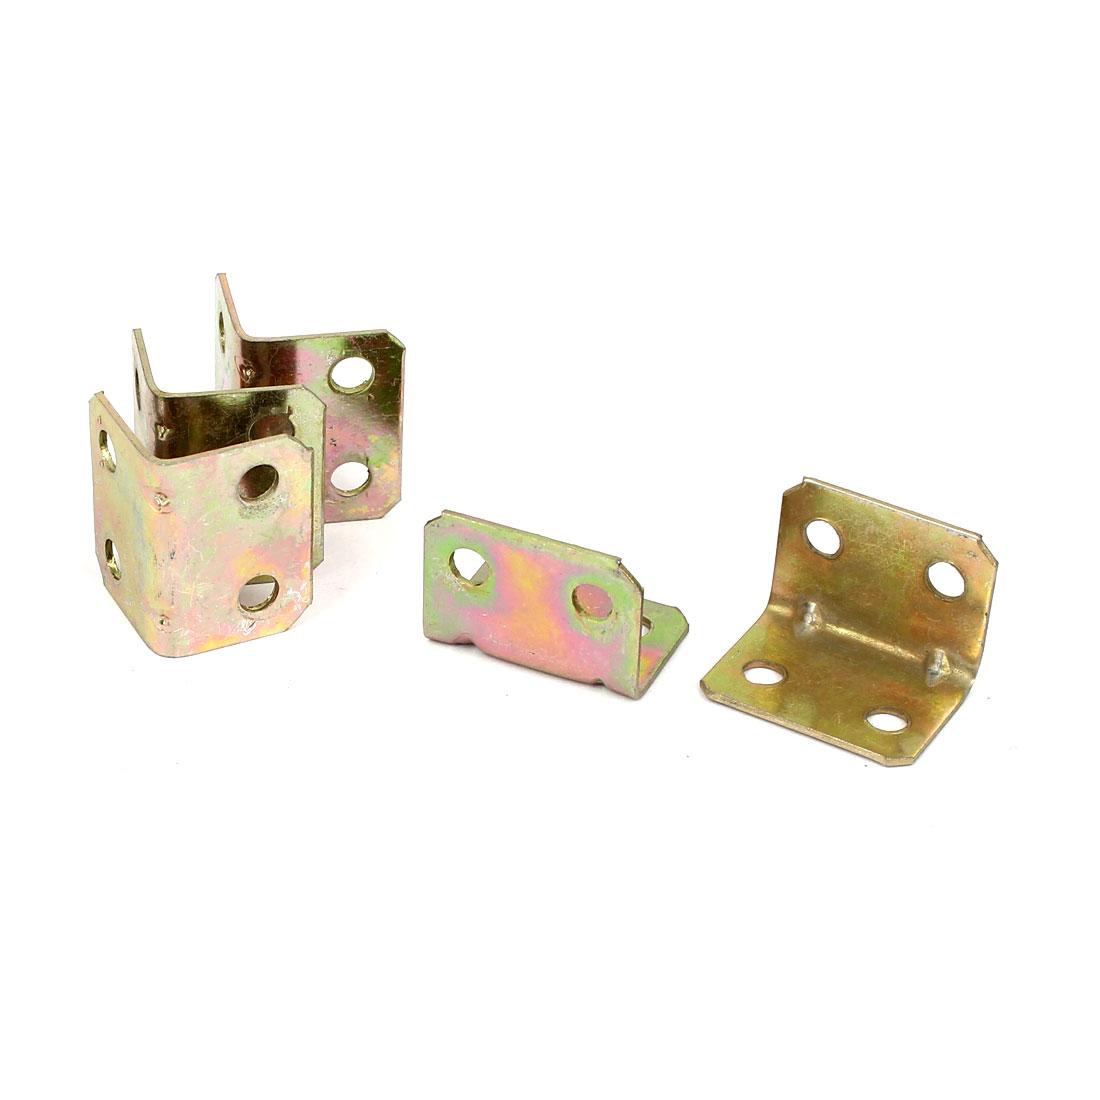 18mmx18mmx24mm Metal Corner Brace Right Angle Bracket 1mm Thickness 5pcs